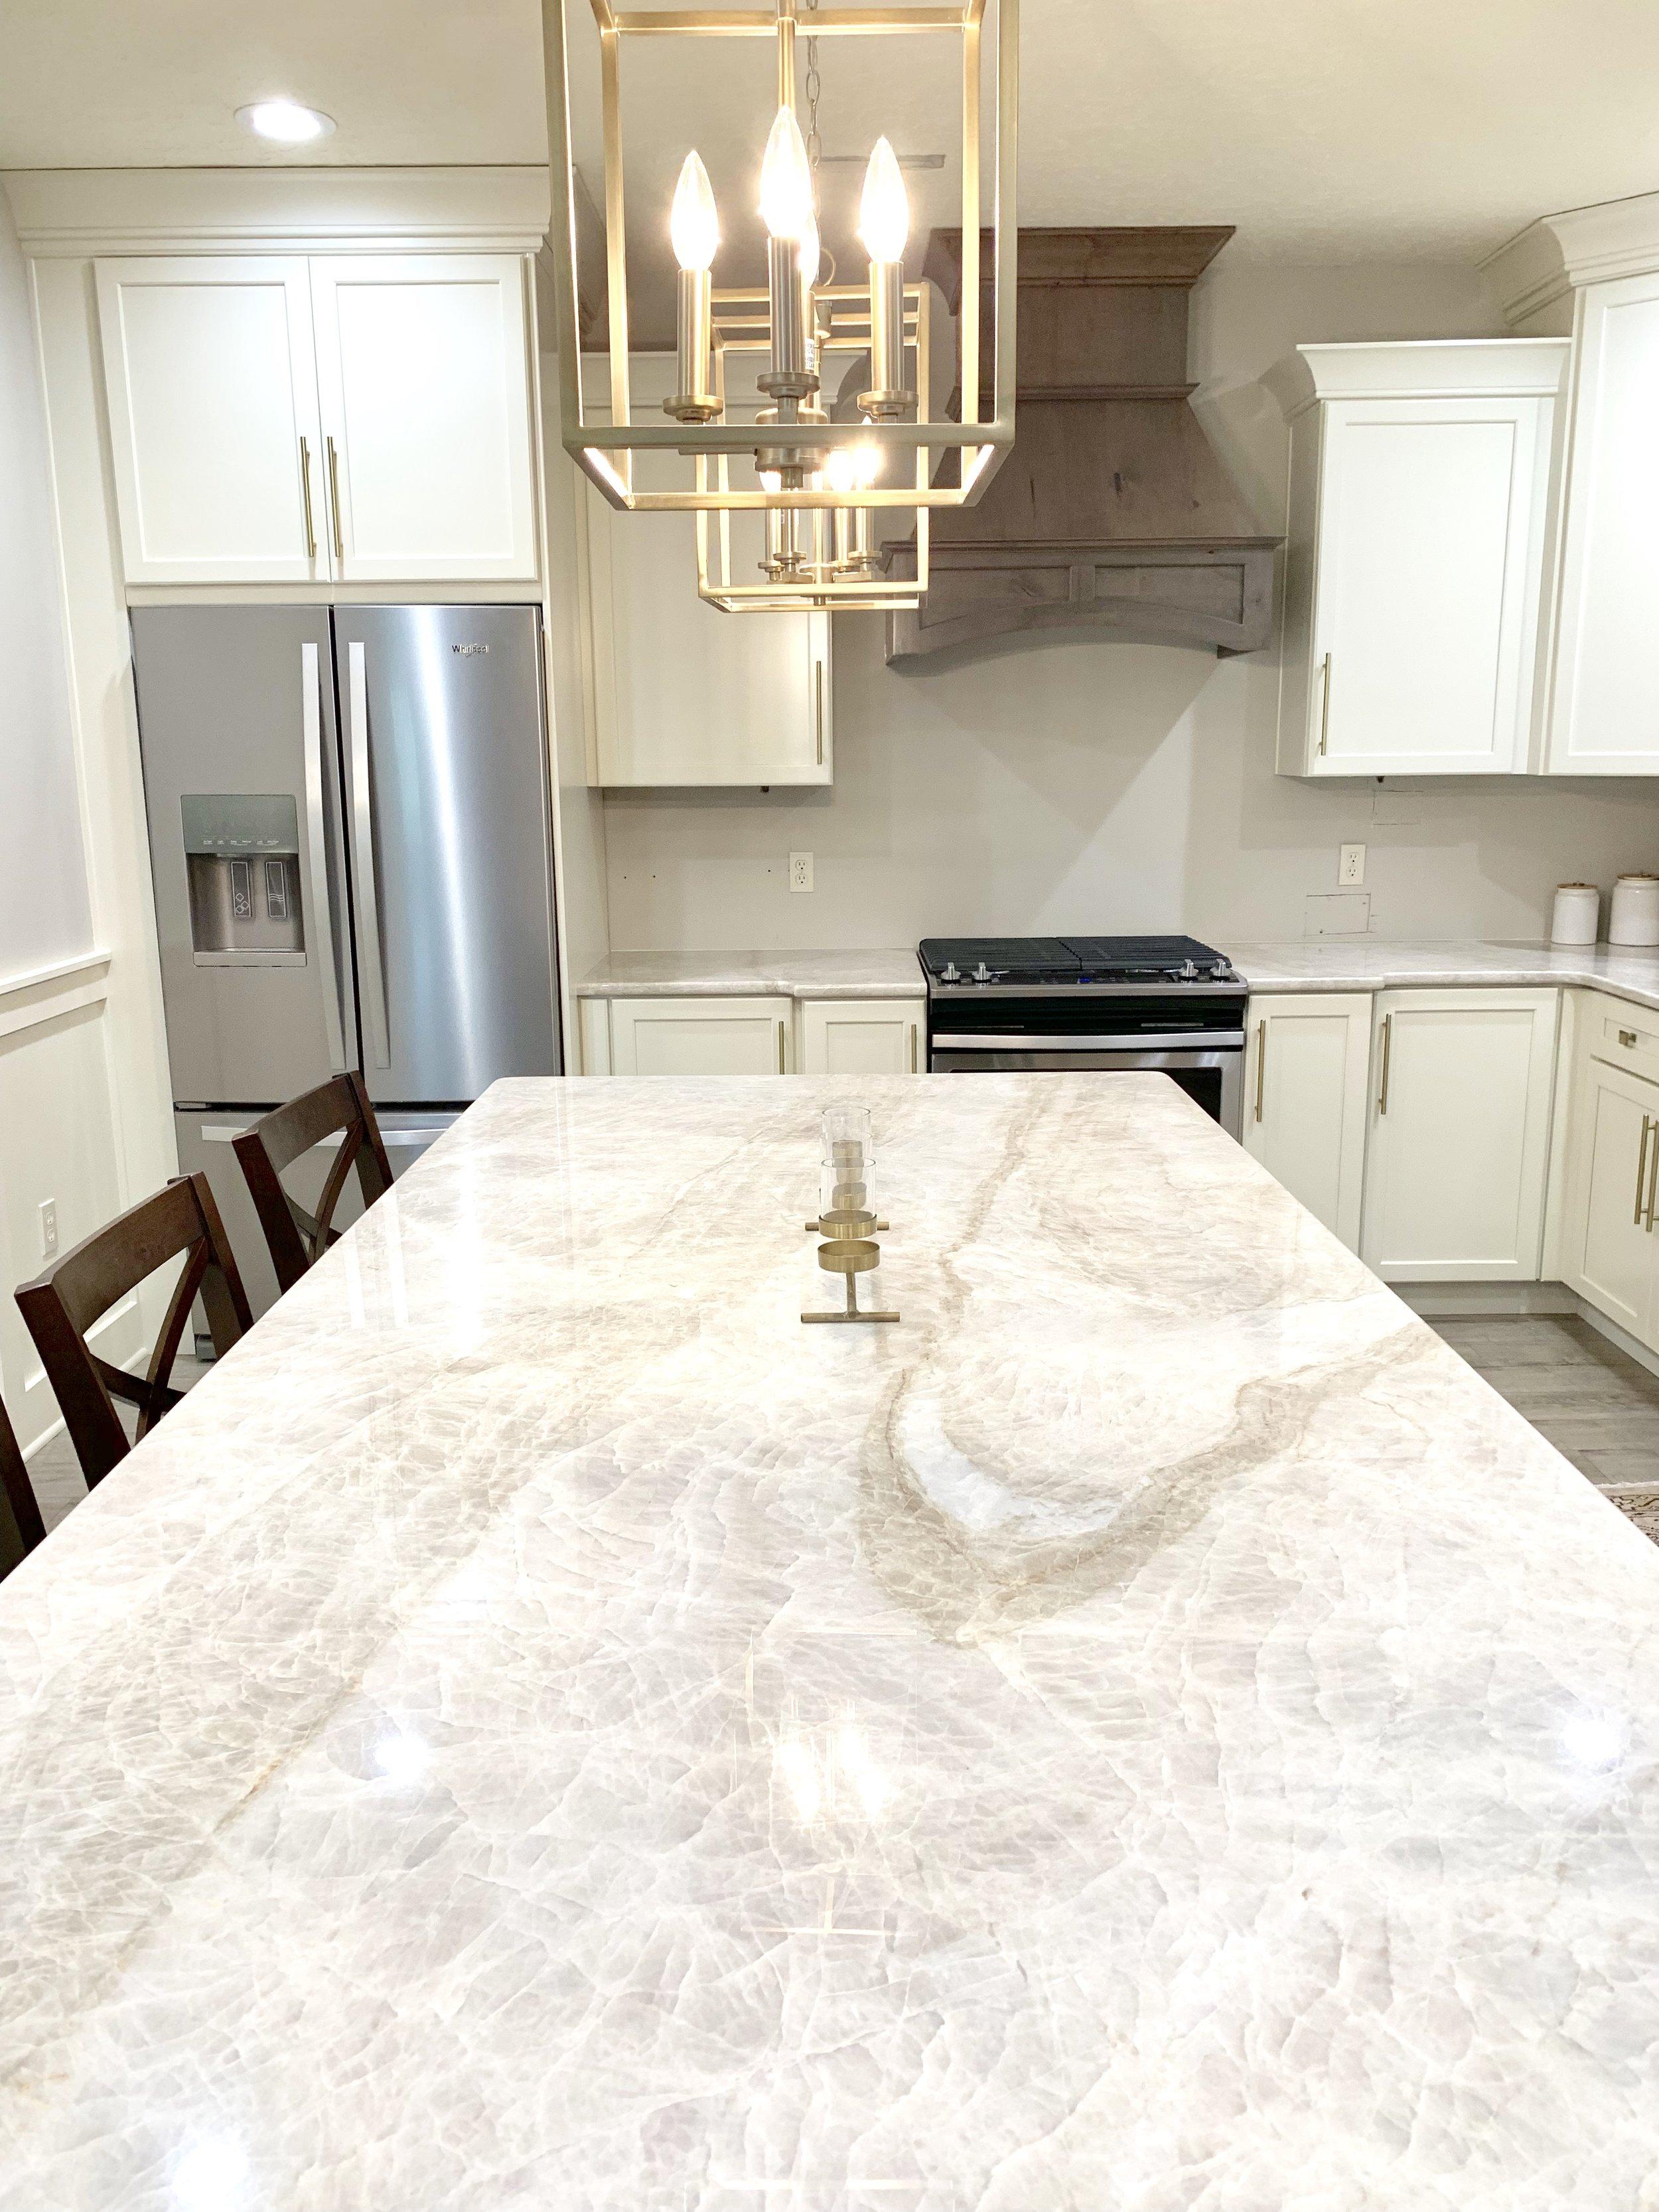 Taj Mahal quartzite countertops in modern farmhouse kitchen by Farmhouse Redefined.